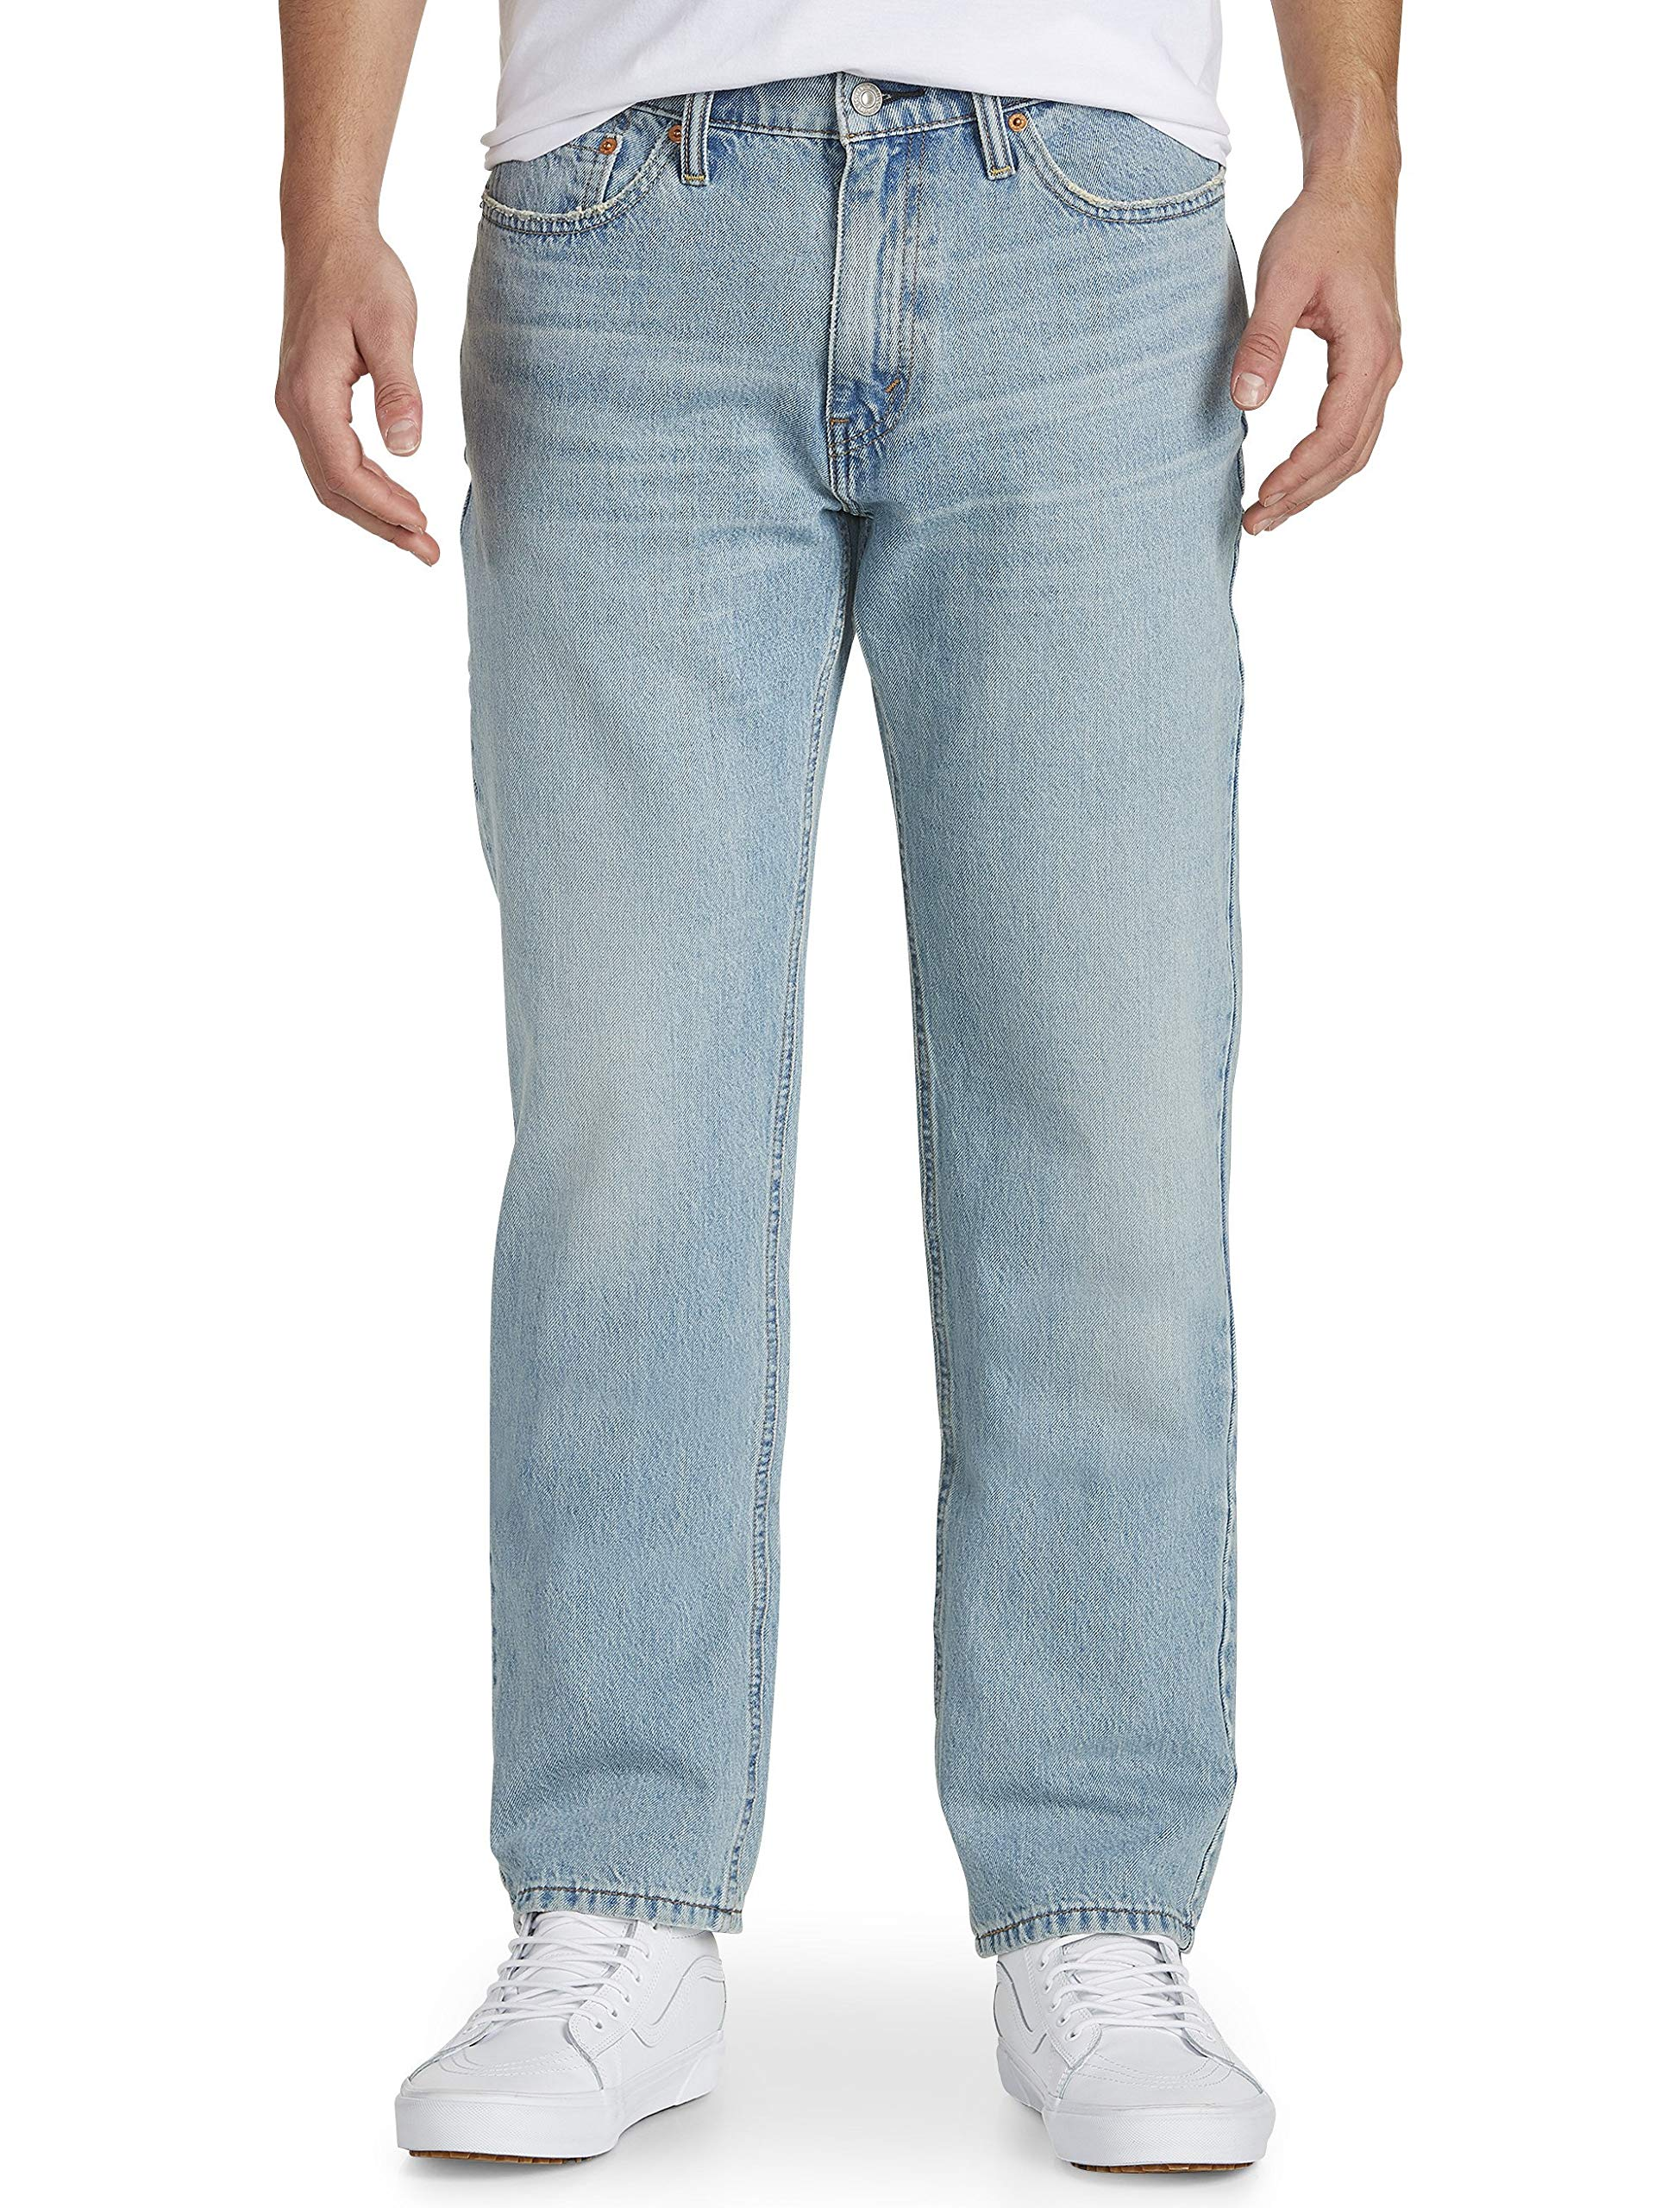 Levi's Men's 541 Athletic Straight Fit Jean, Gingham-Warp Stretch, 42W x 30L